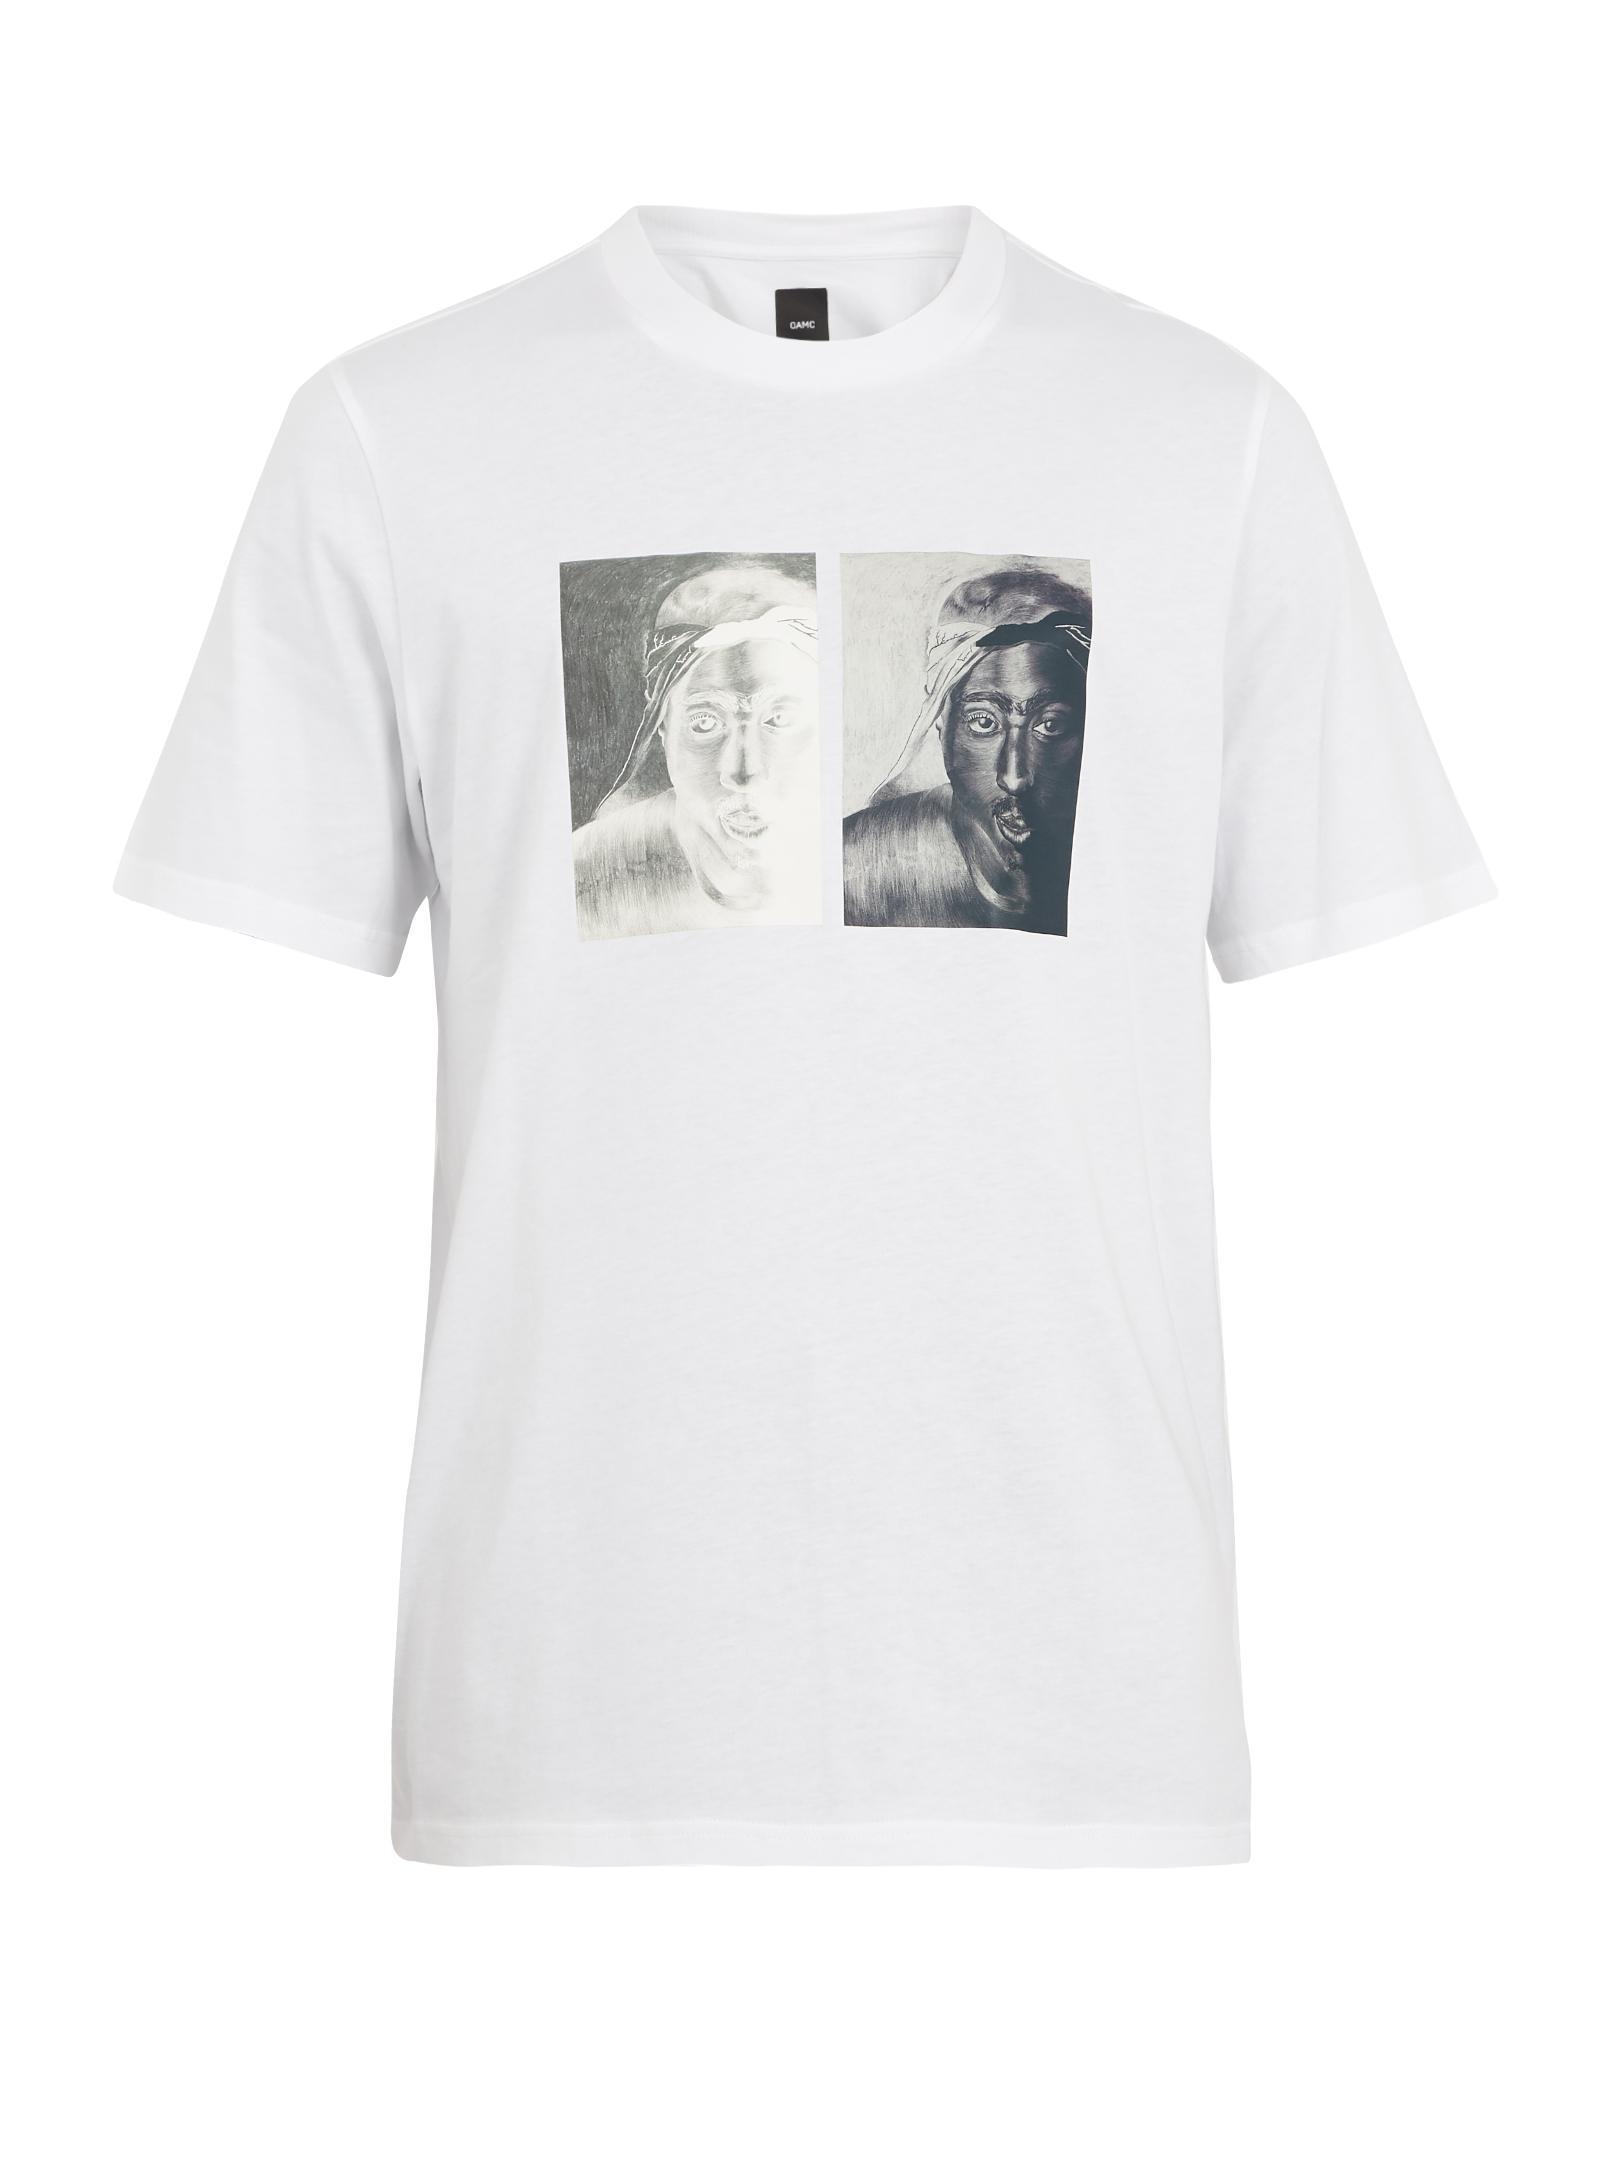 hand print T-shirt - Black OAMC Cheap Best Wholesale taocDYPP